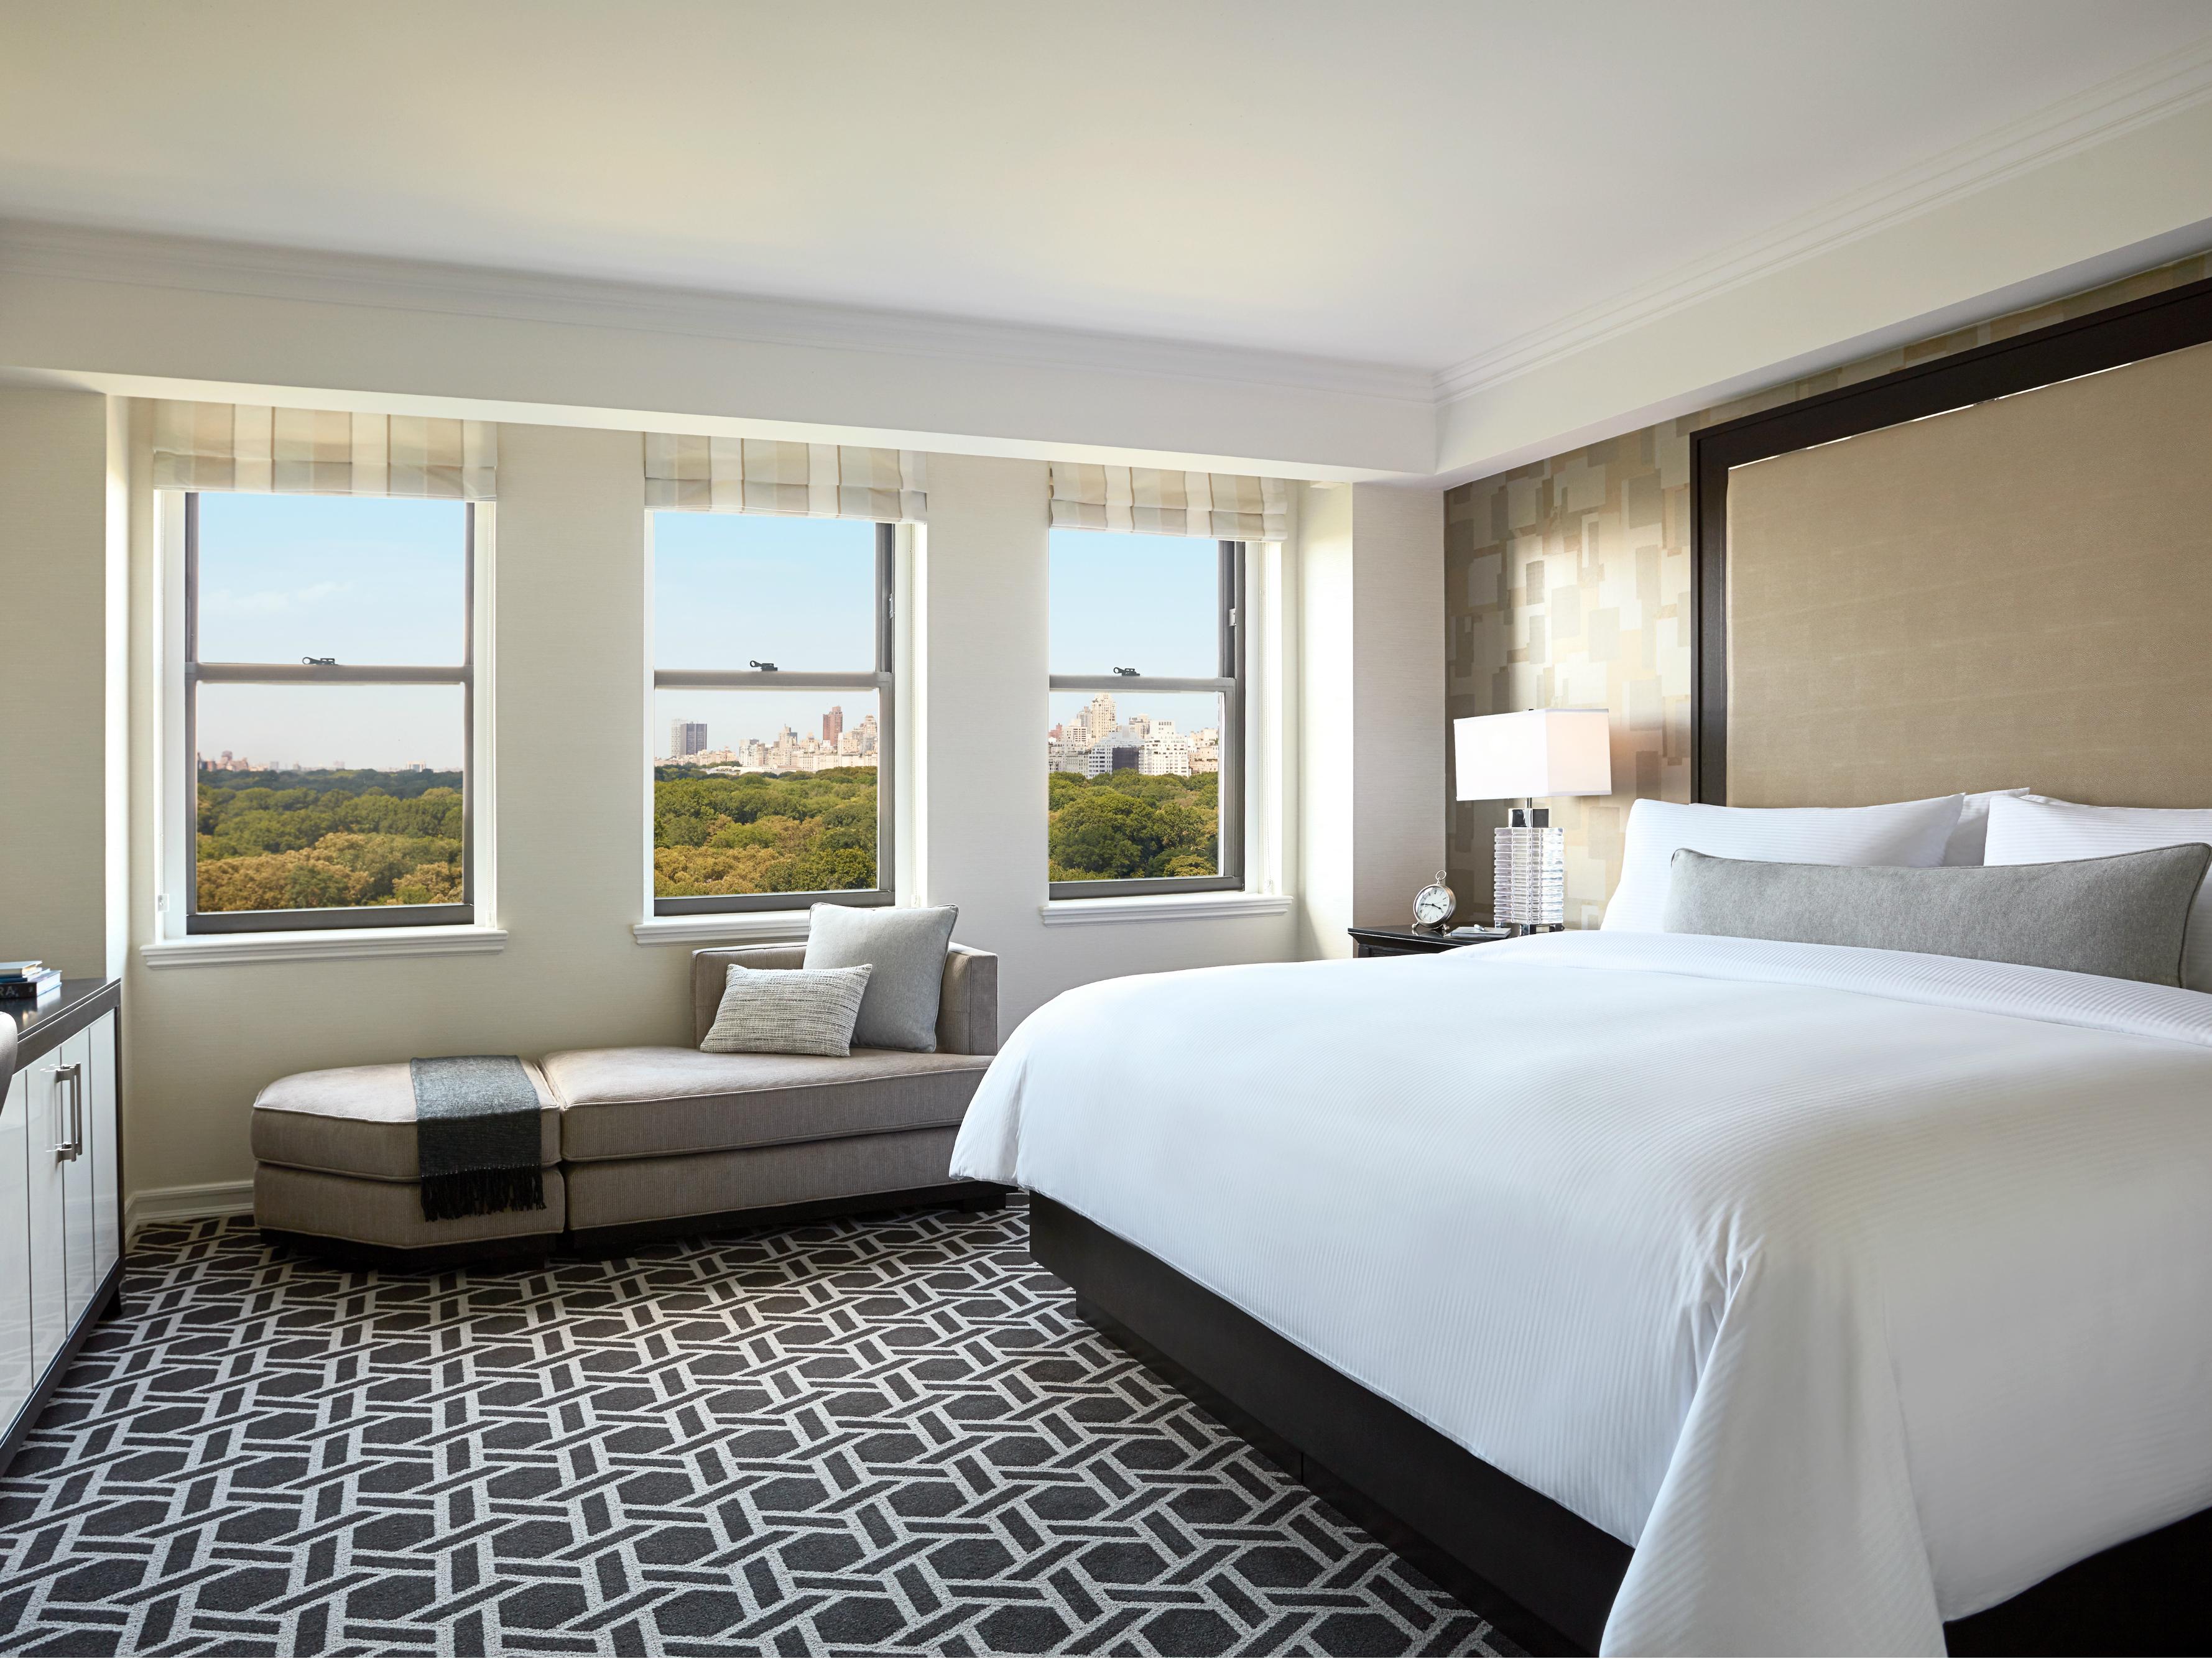 JW Marriott Essex House New York Central Park king bed guestroom